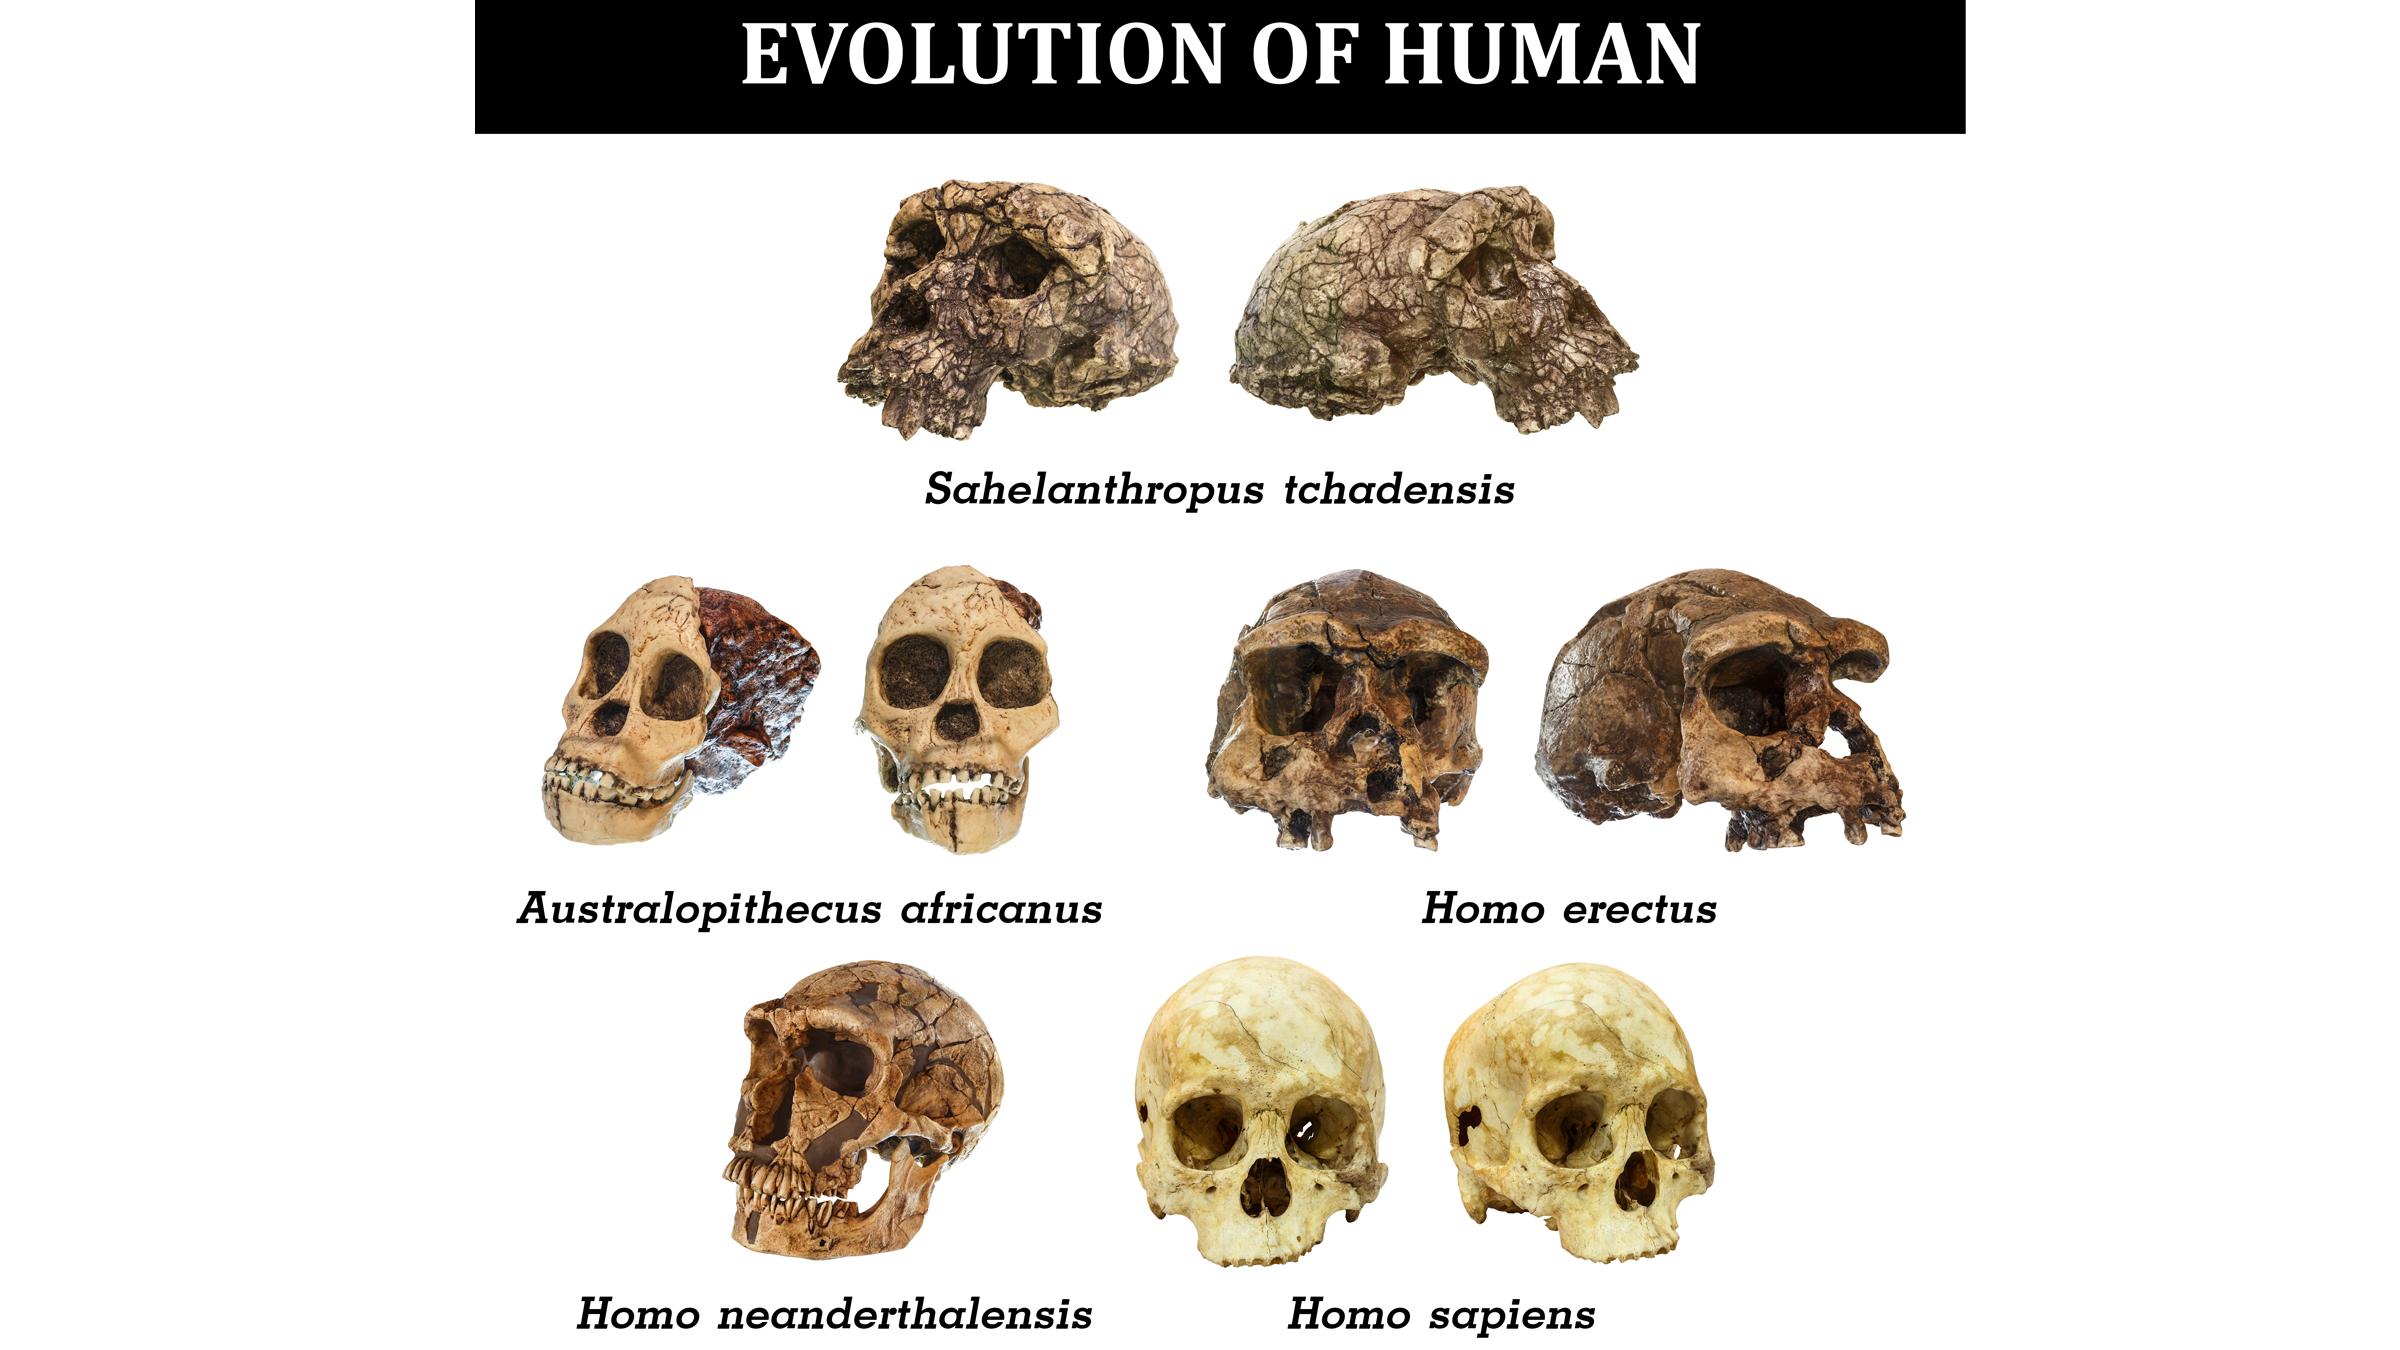 skulls of early human species